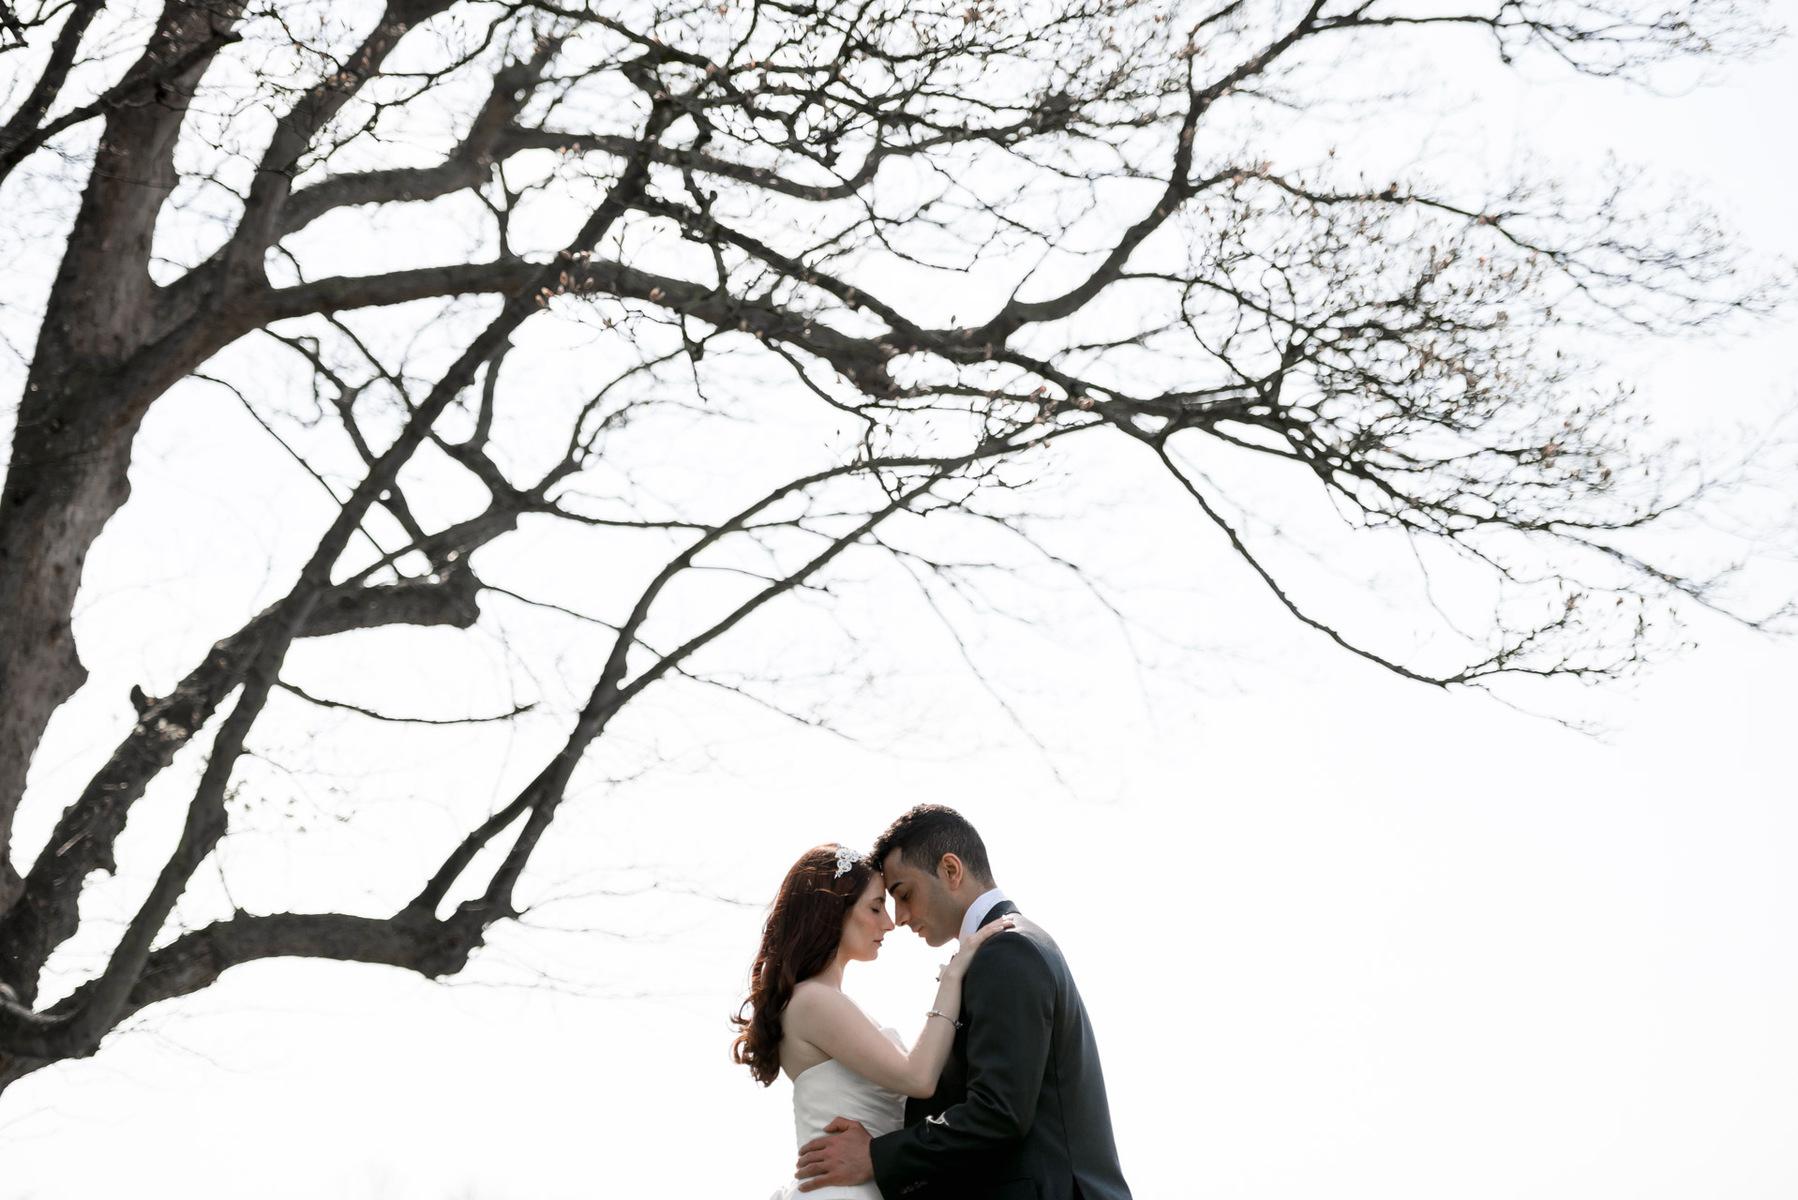 Home - ?pp route=%2Fimage resize&path=L2hvbWUvY3VzdG9tZXIvd3d3L25hc3NlcmdhemkuY29tL3B1YmxpY19odG1sL3dwLWNvbnRlbnQvdXBsb2Fkcy8yMDE3LzA3LzE3LTE3LXBwX2dhbGxlcnkvRFNDXzAyODctMi5qcGc%3D&template id=1a69c09f c751 4210 9b58 896cb45e7bce&width=768 by Nasser Gazi London Wedding Photographer